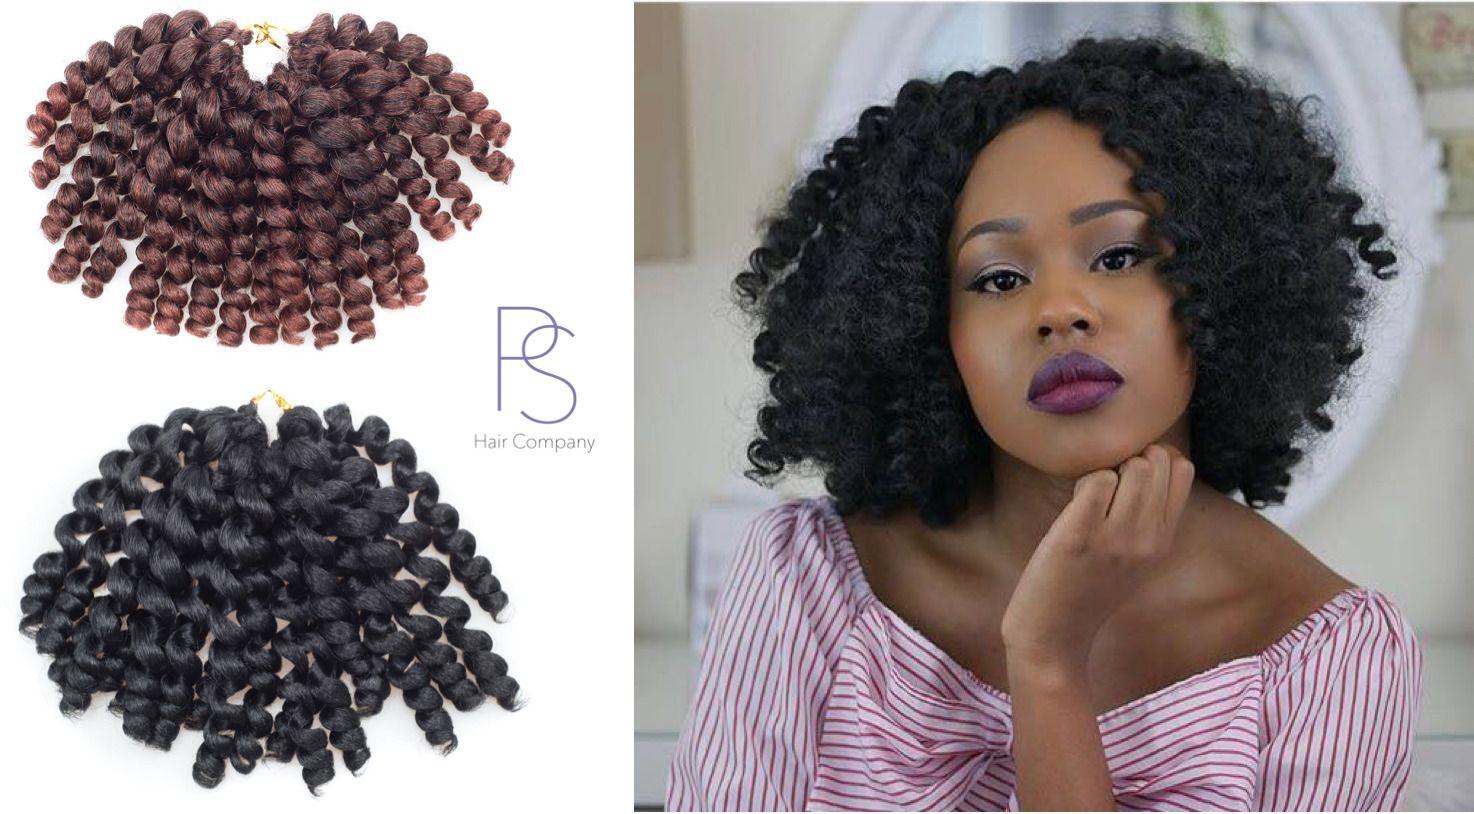 Profstyles Hair Irons ebay Fashion  Crochet braid Crochet braids